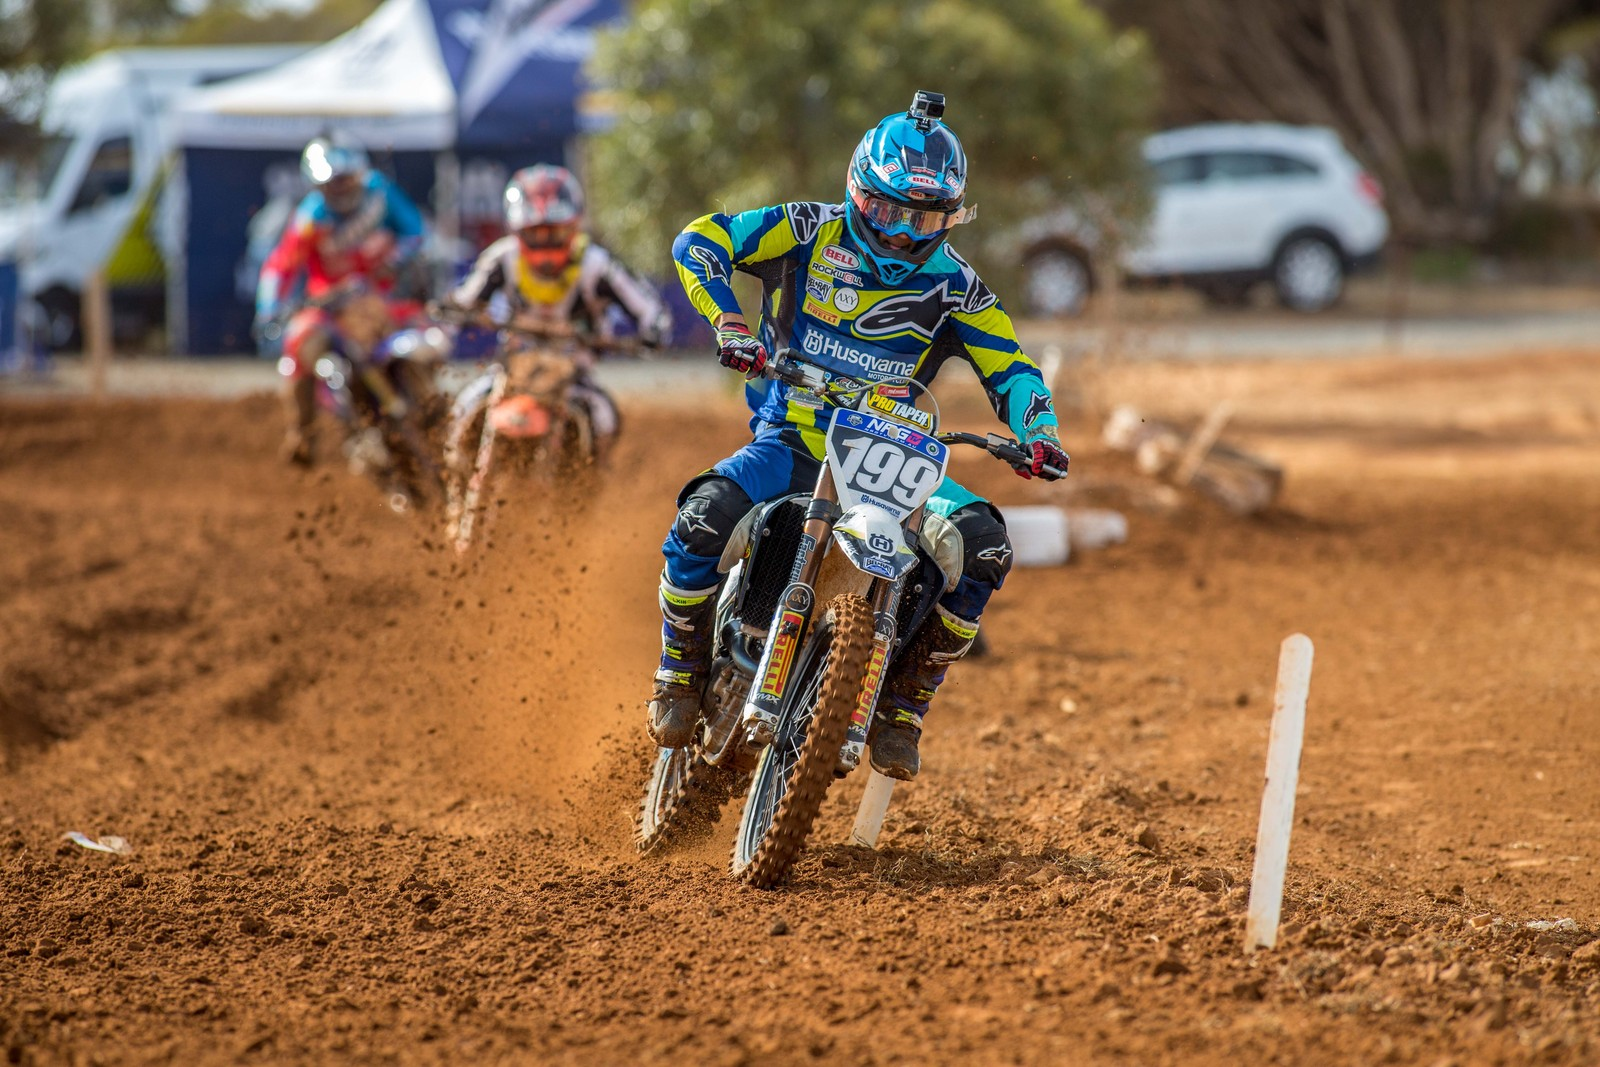 Nathan Crawford - Australian Motul Mx Championships: Round 4, Murray Bridge - Motocross Pictures - Vital MX